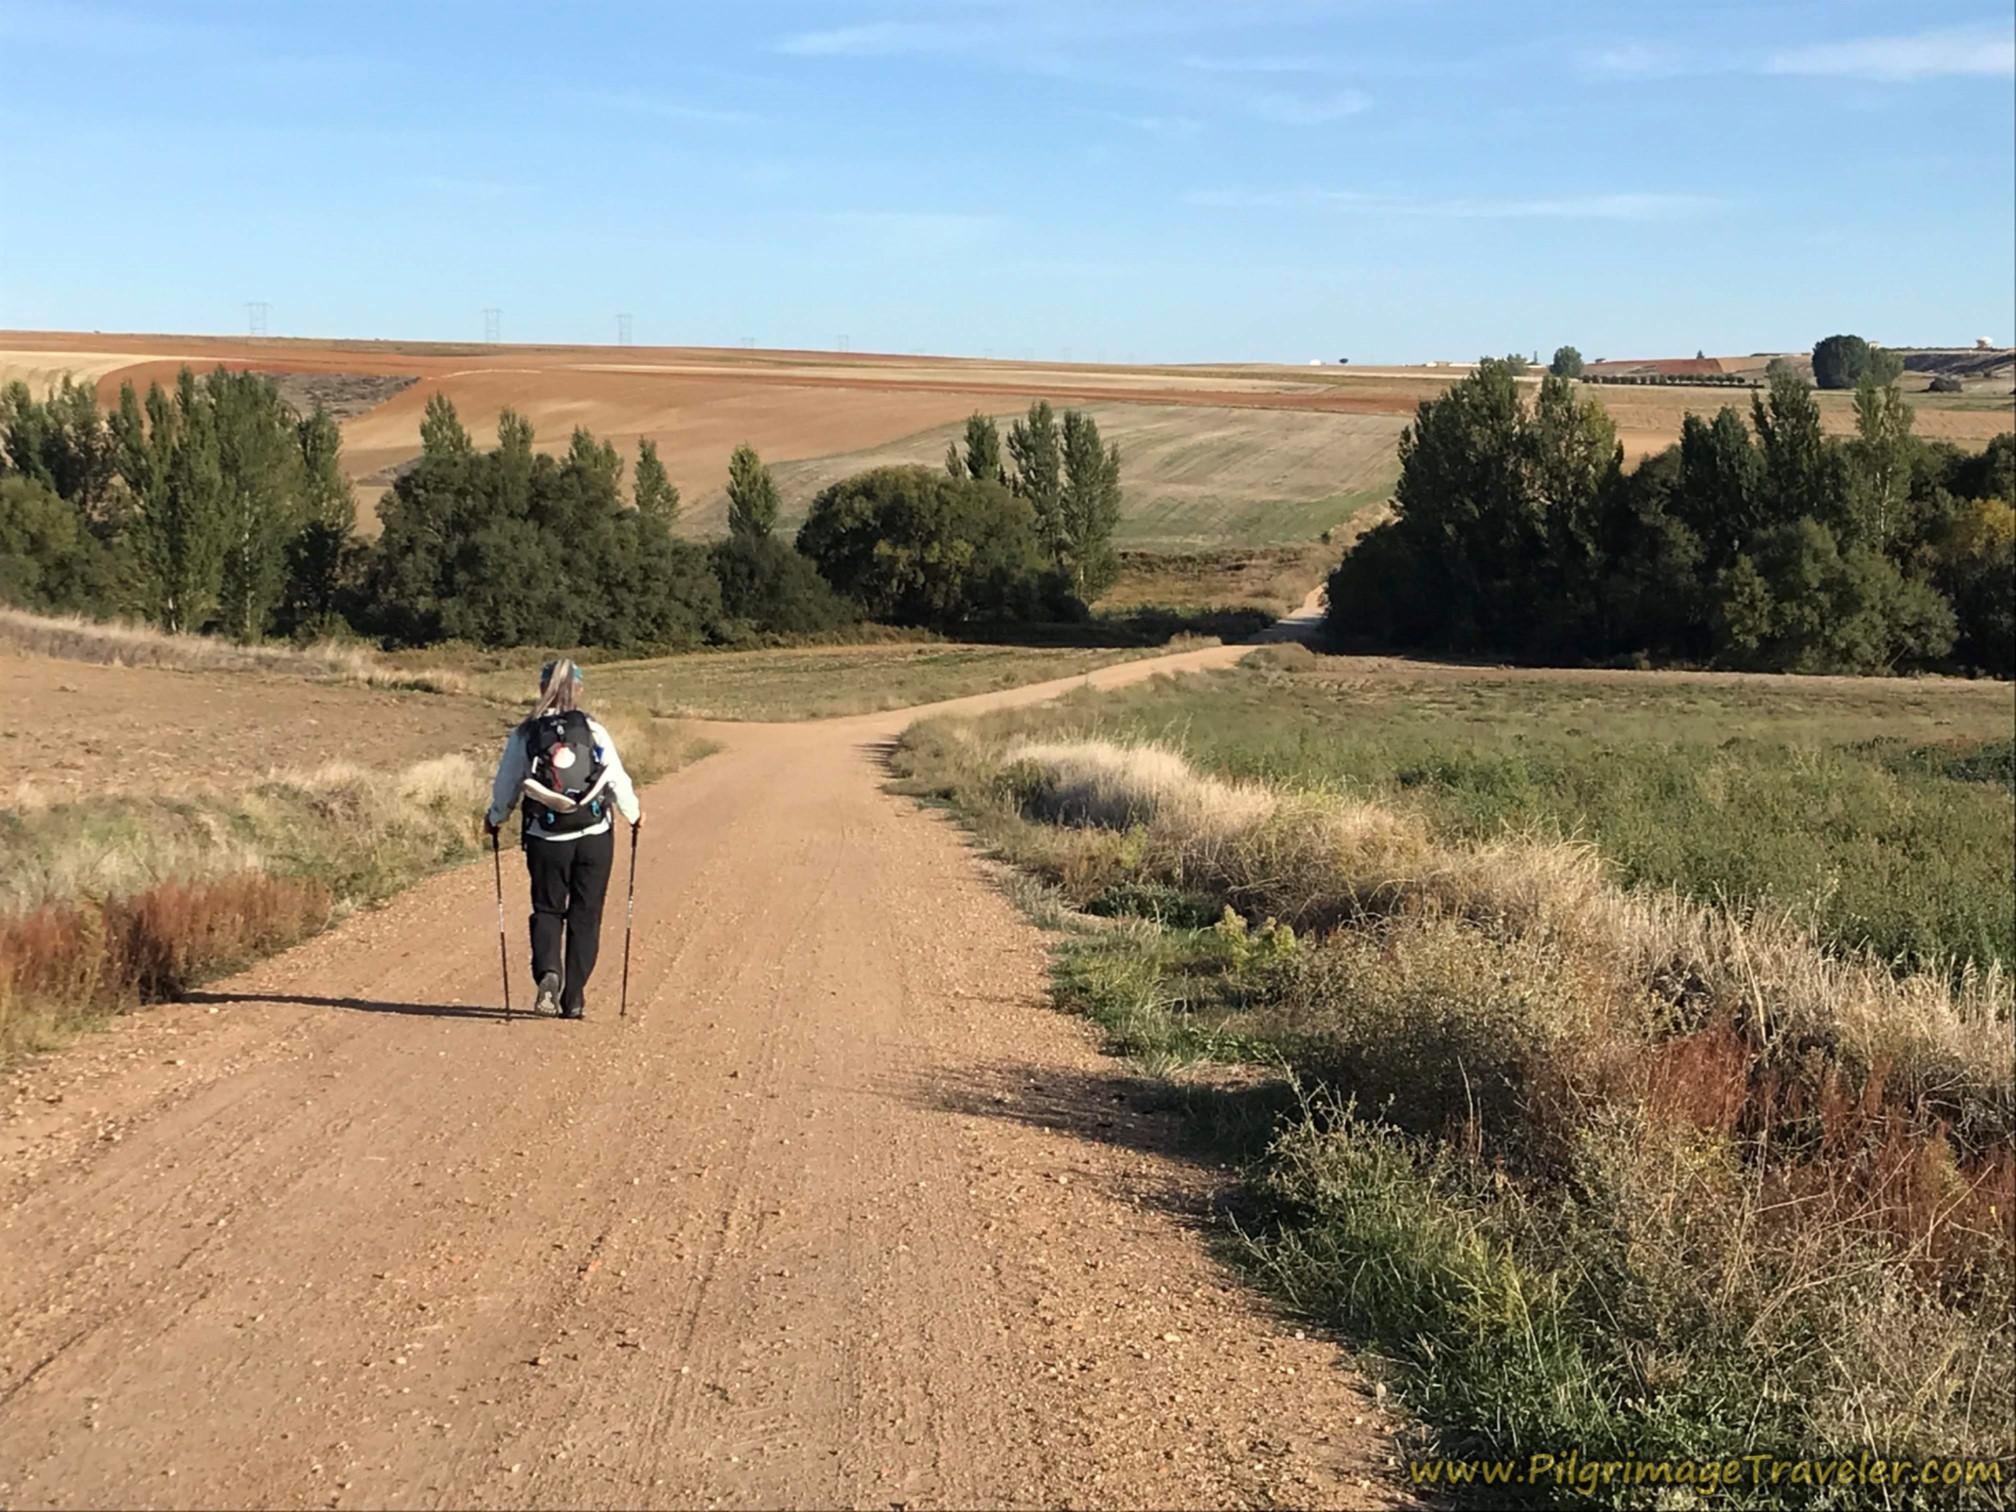 Camino de Castellanos